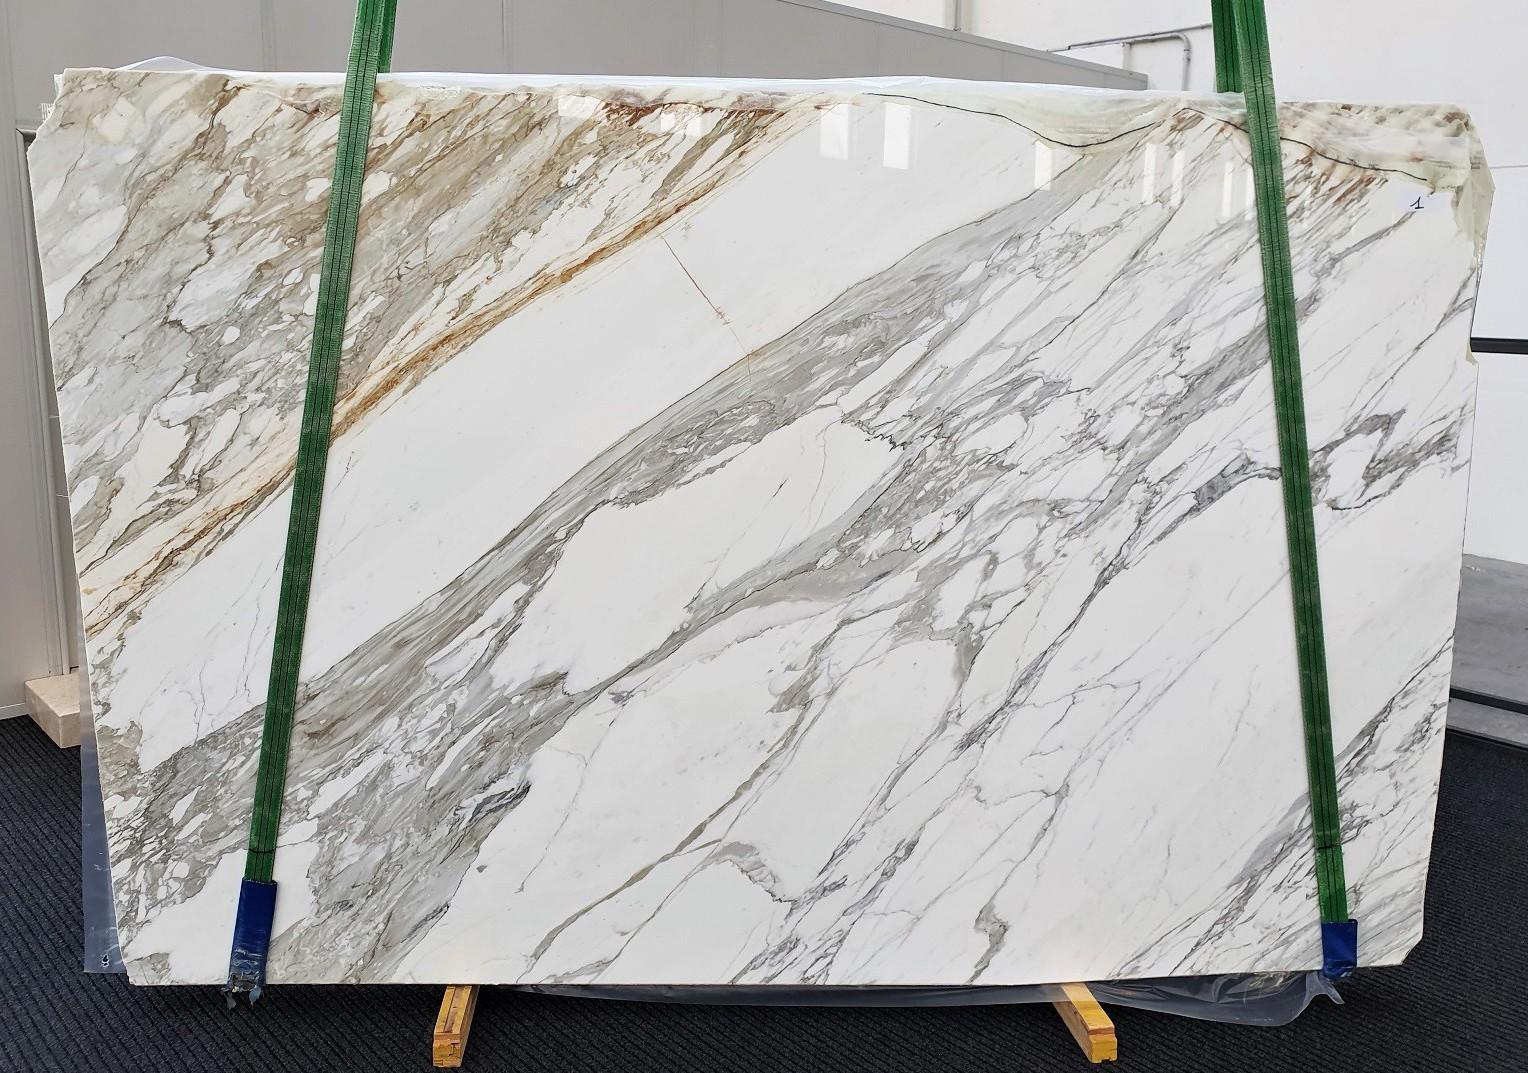 CALACATTA Fourniture Veneto (Italie) d' dalles brillantes en marbre naturel 1344 , A - slab #01